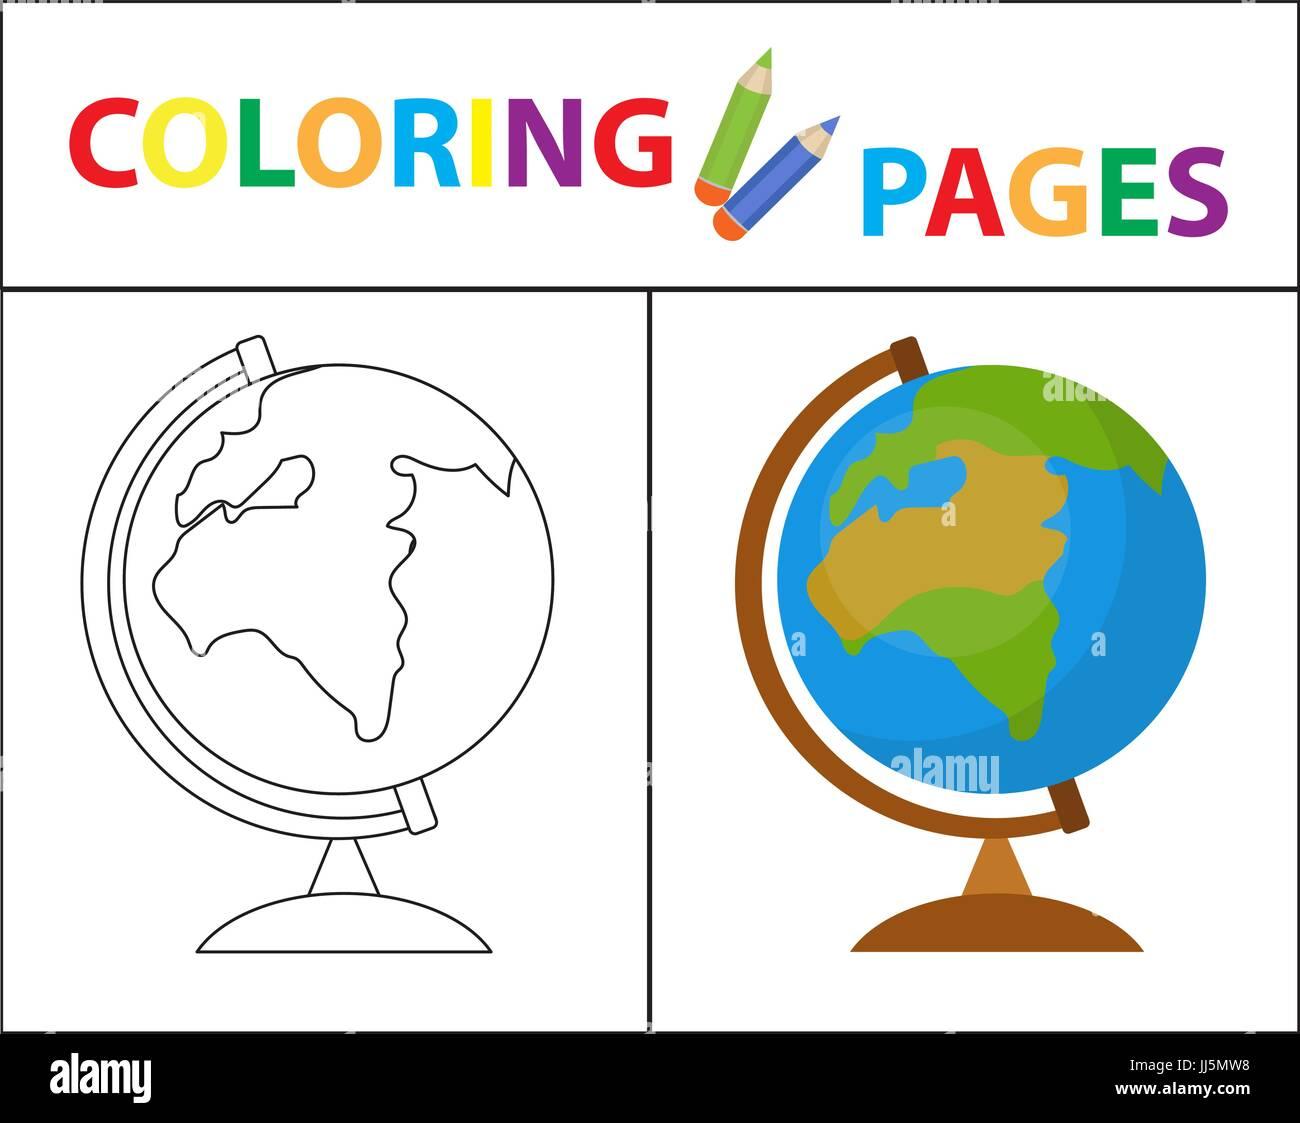 Coloring Book Seite. Globus. Skizze Kontur und Farbe Version ...